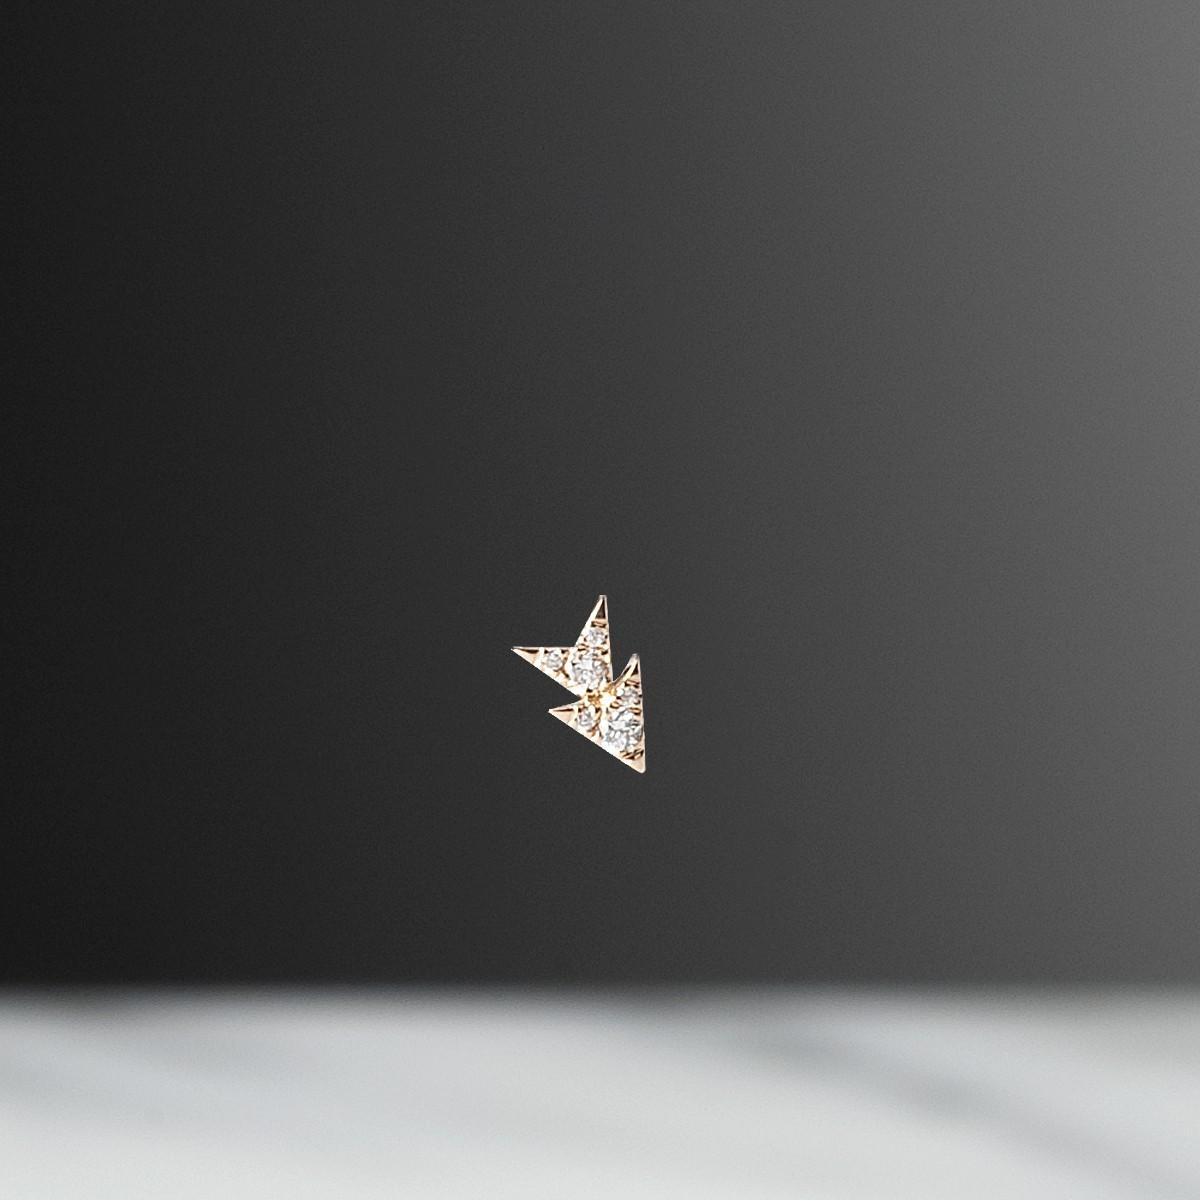 fleche-1964-rose-gold-white-diamond